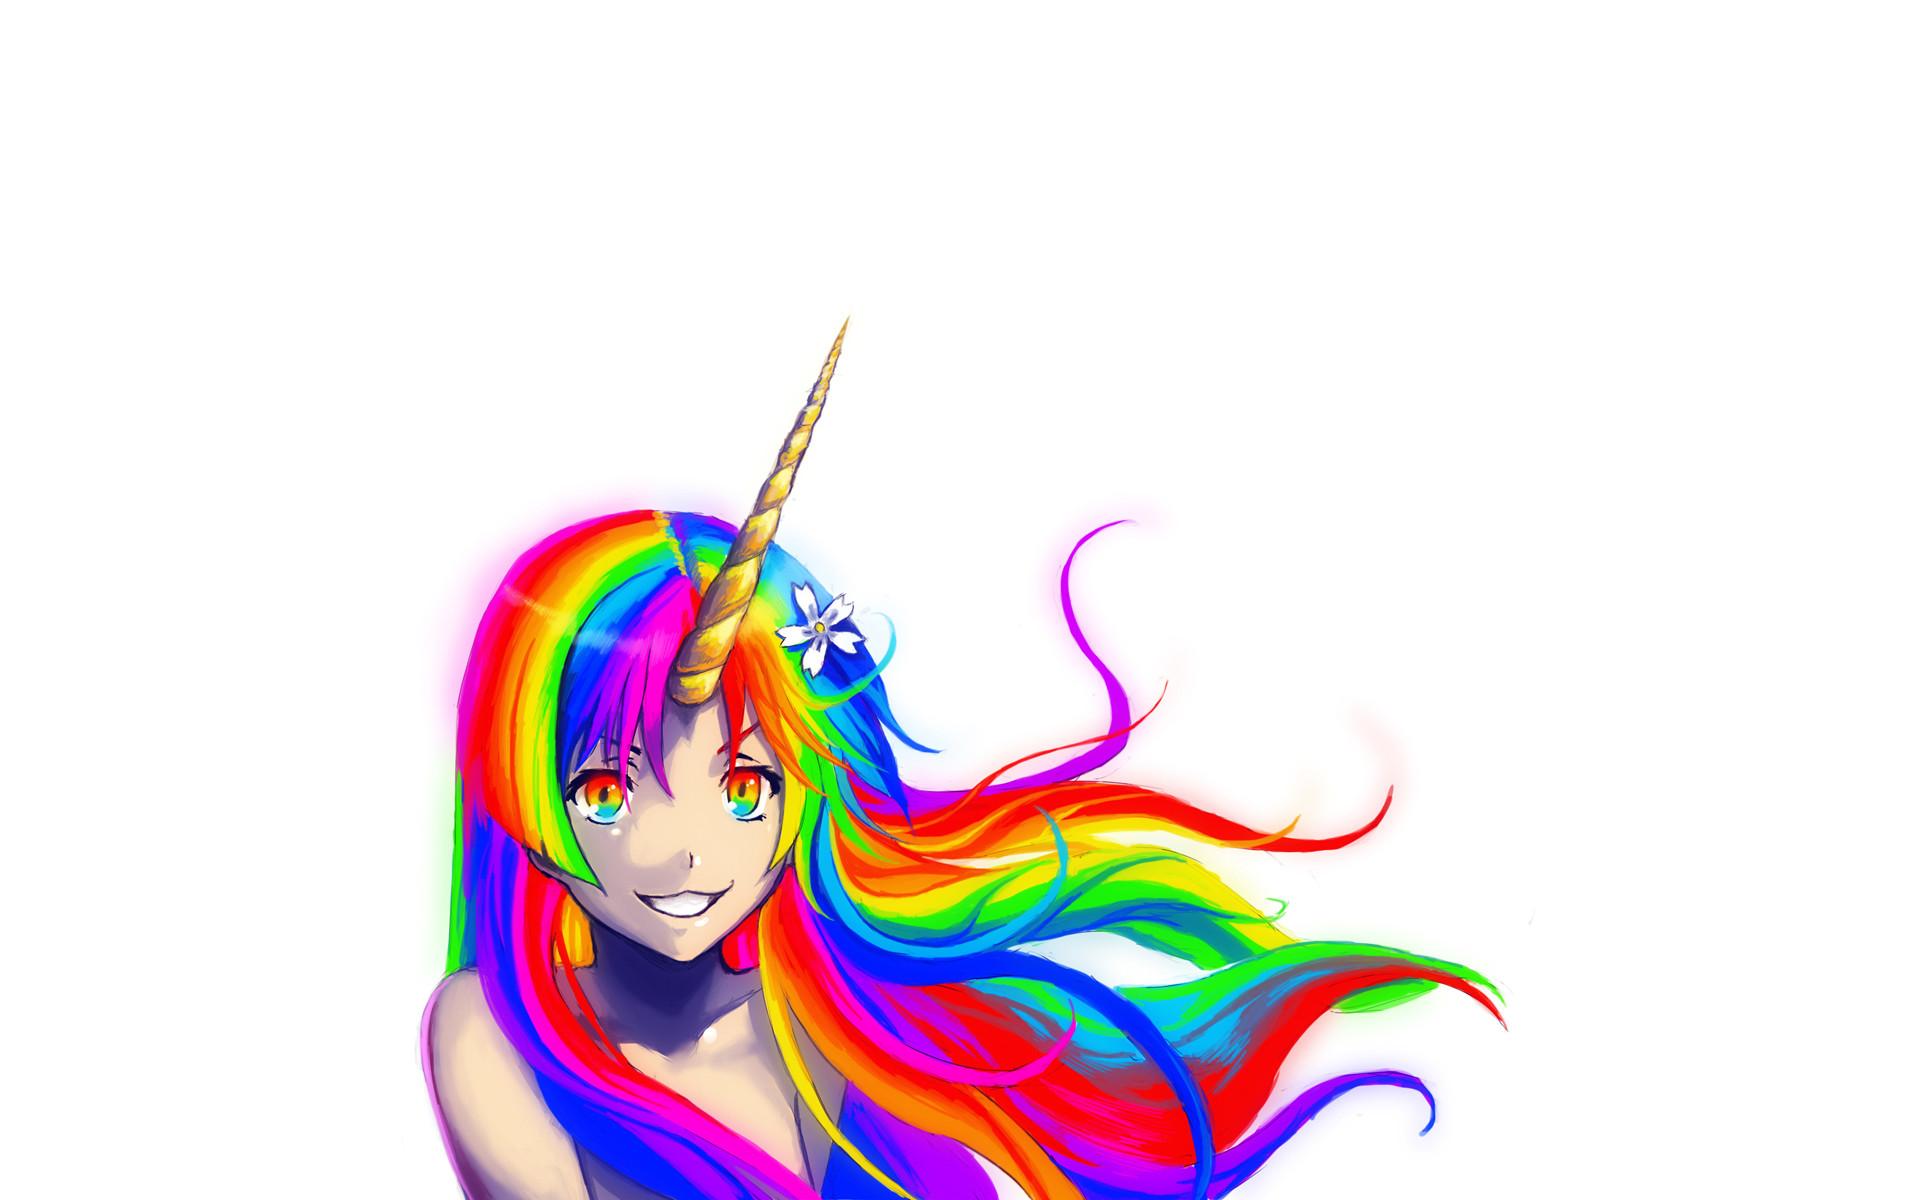 Unicorns Rainbows Wallpaper Unicorns, Rainbows, Bright, Soft .